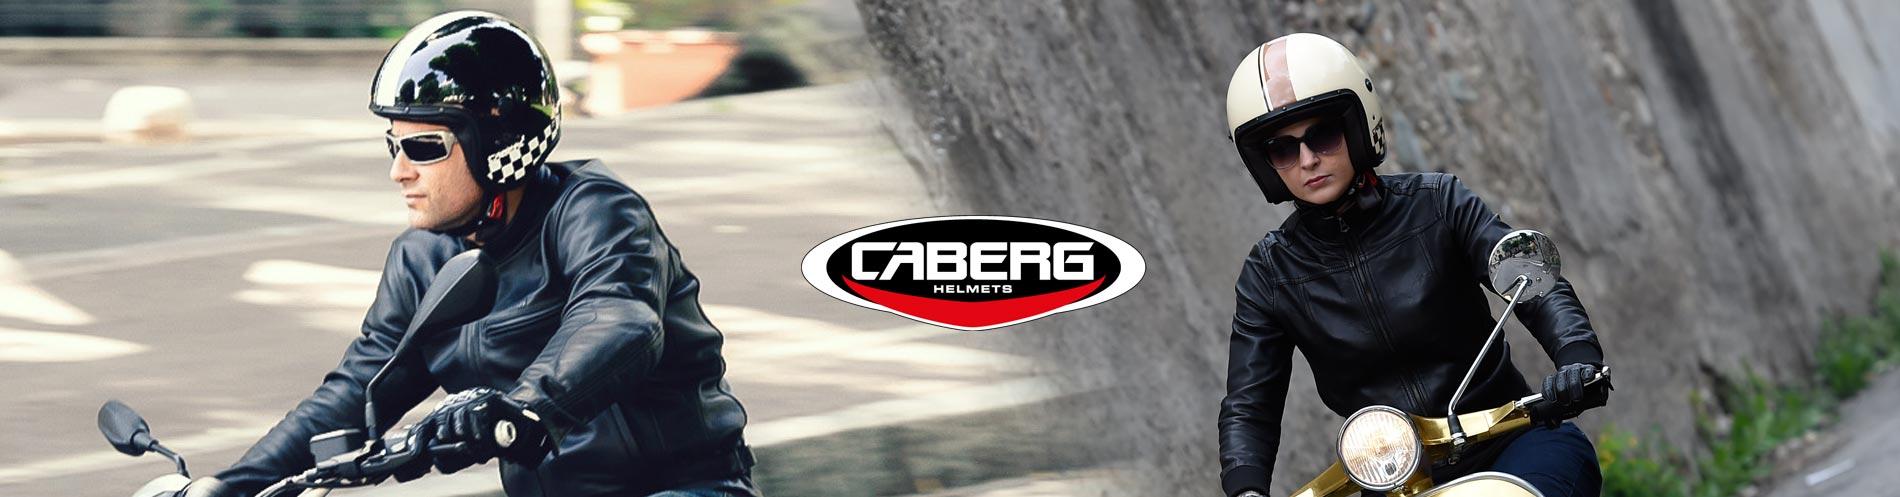 Caberg Freeride